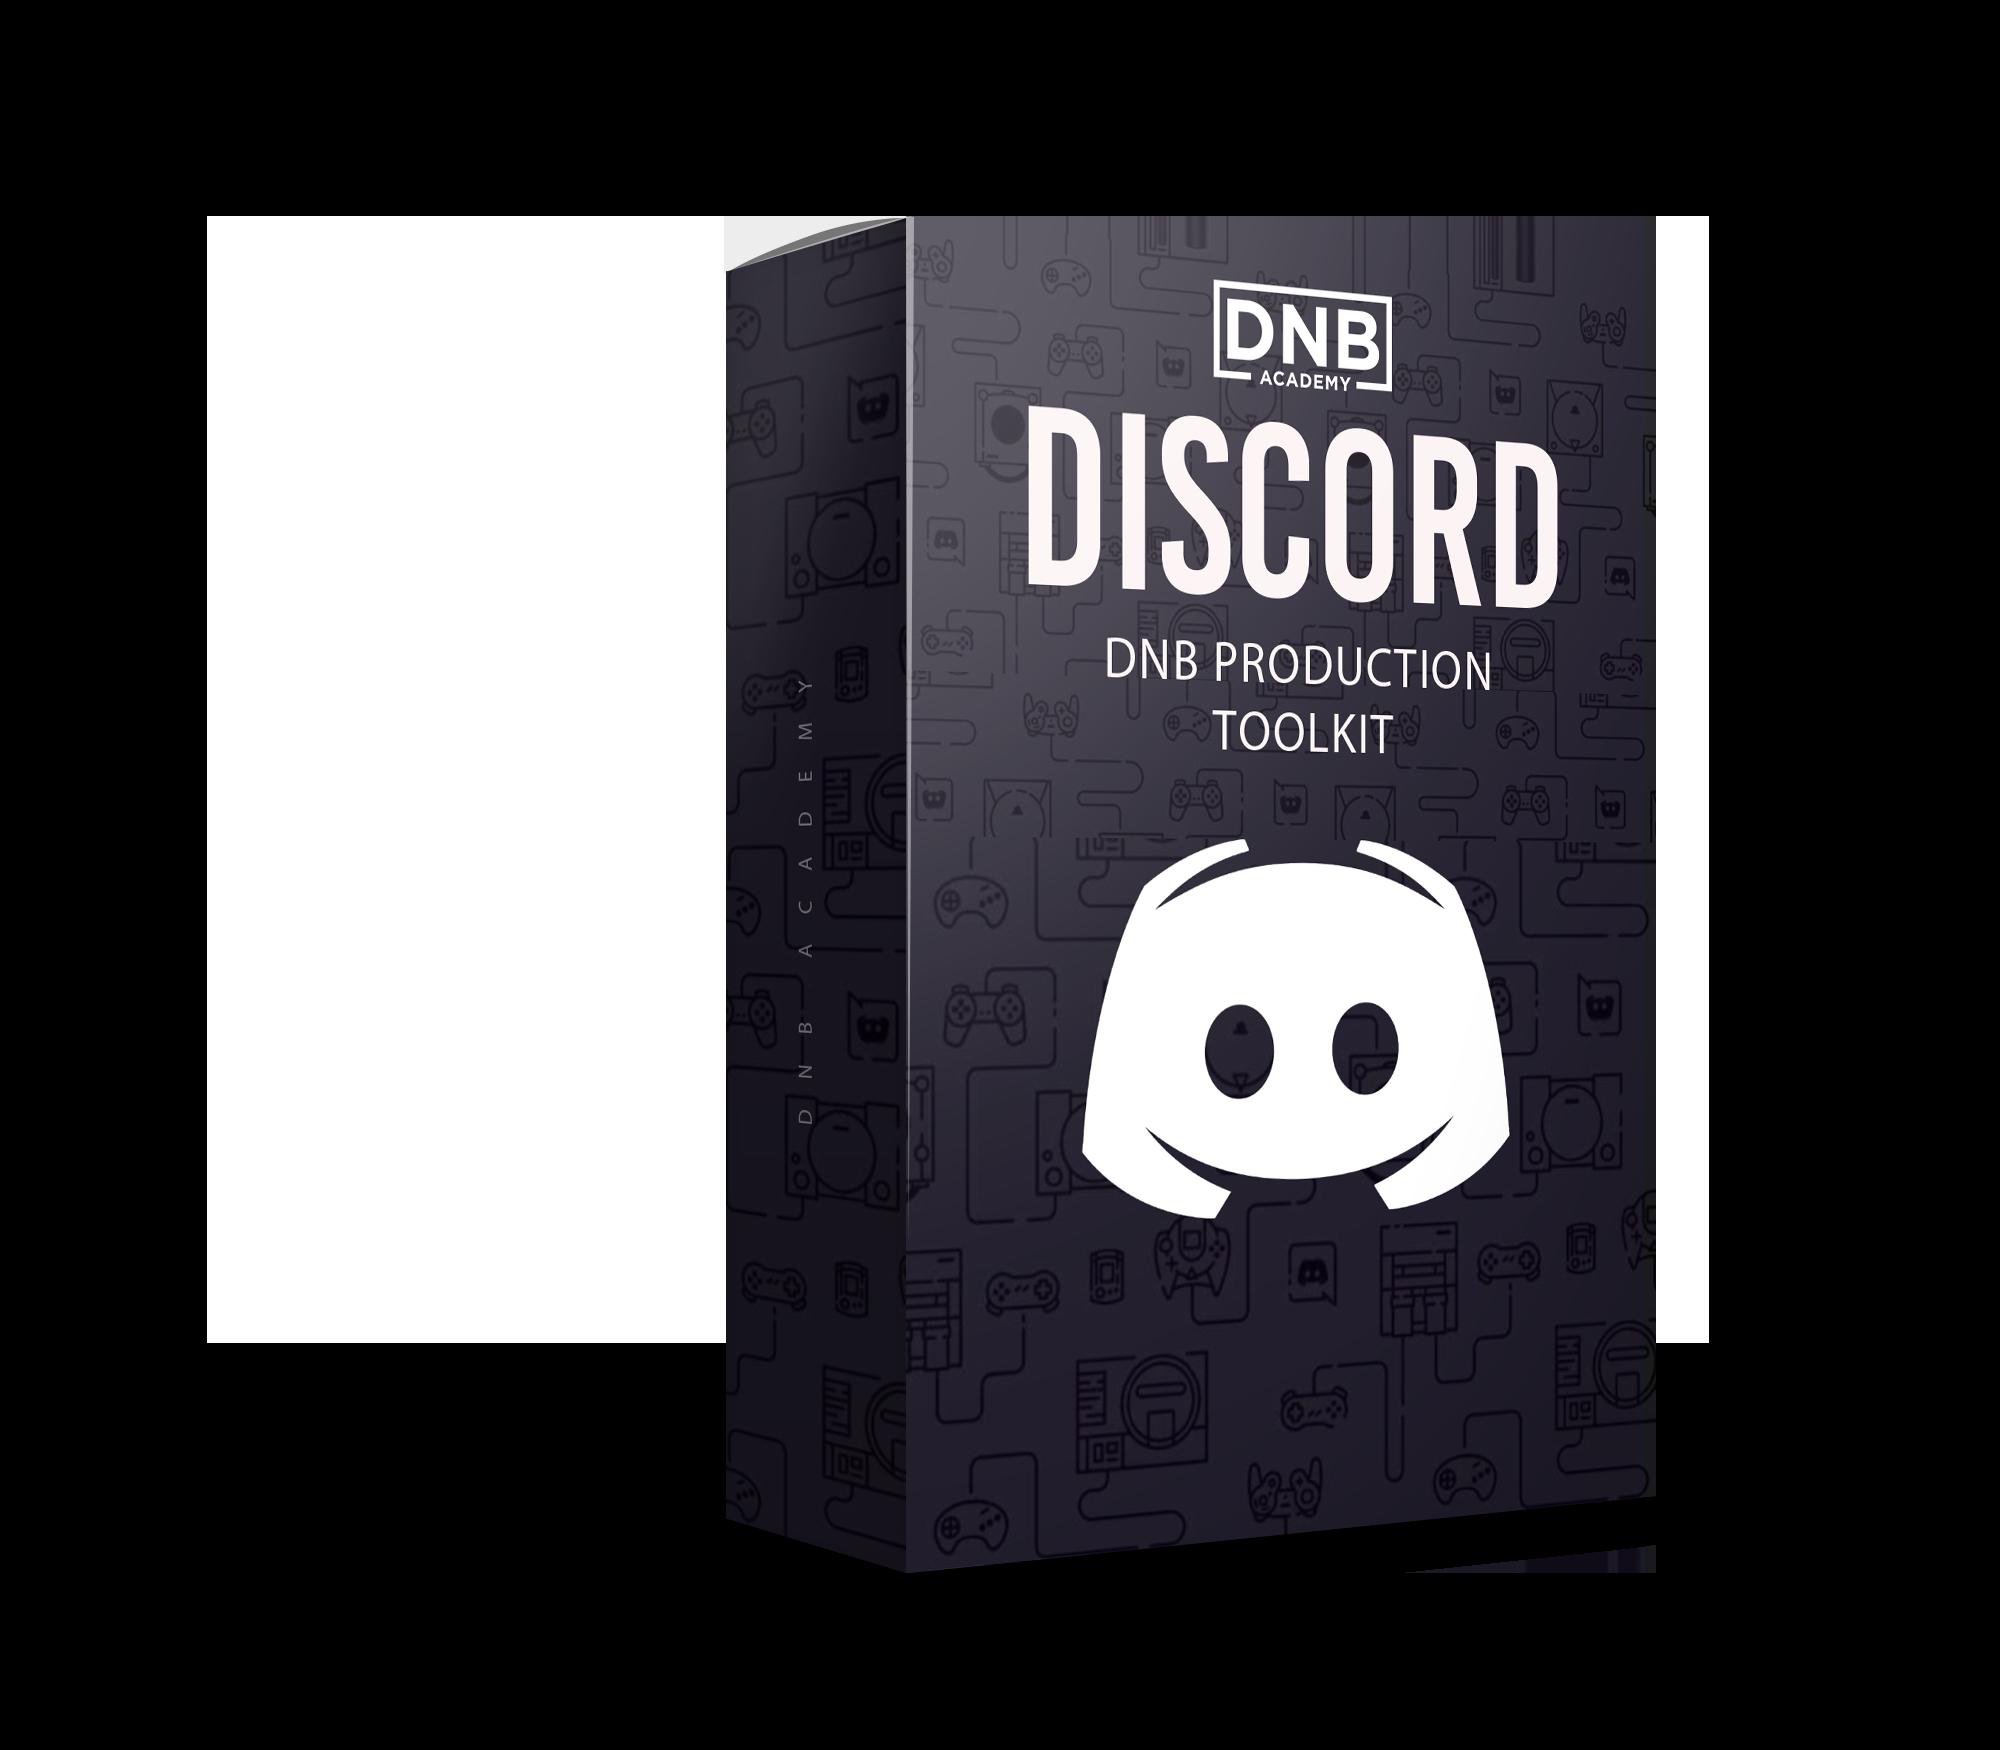 DNB Academy - Discord pack